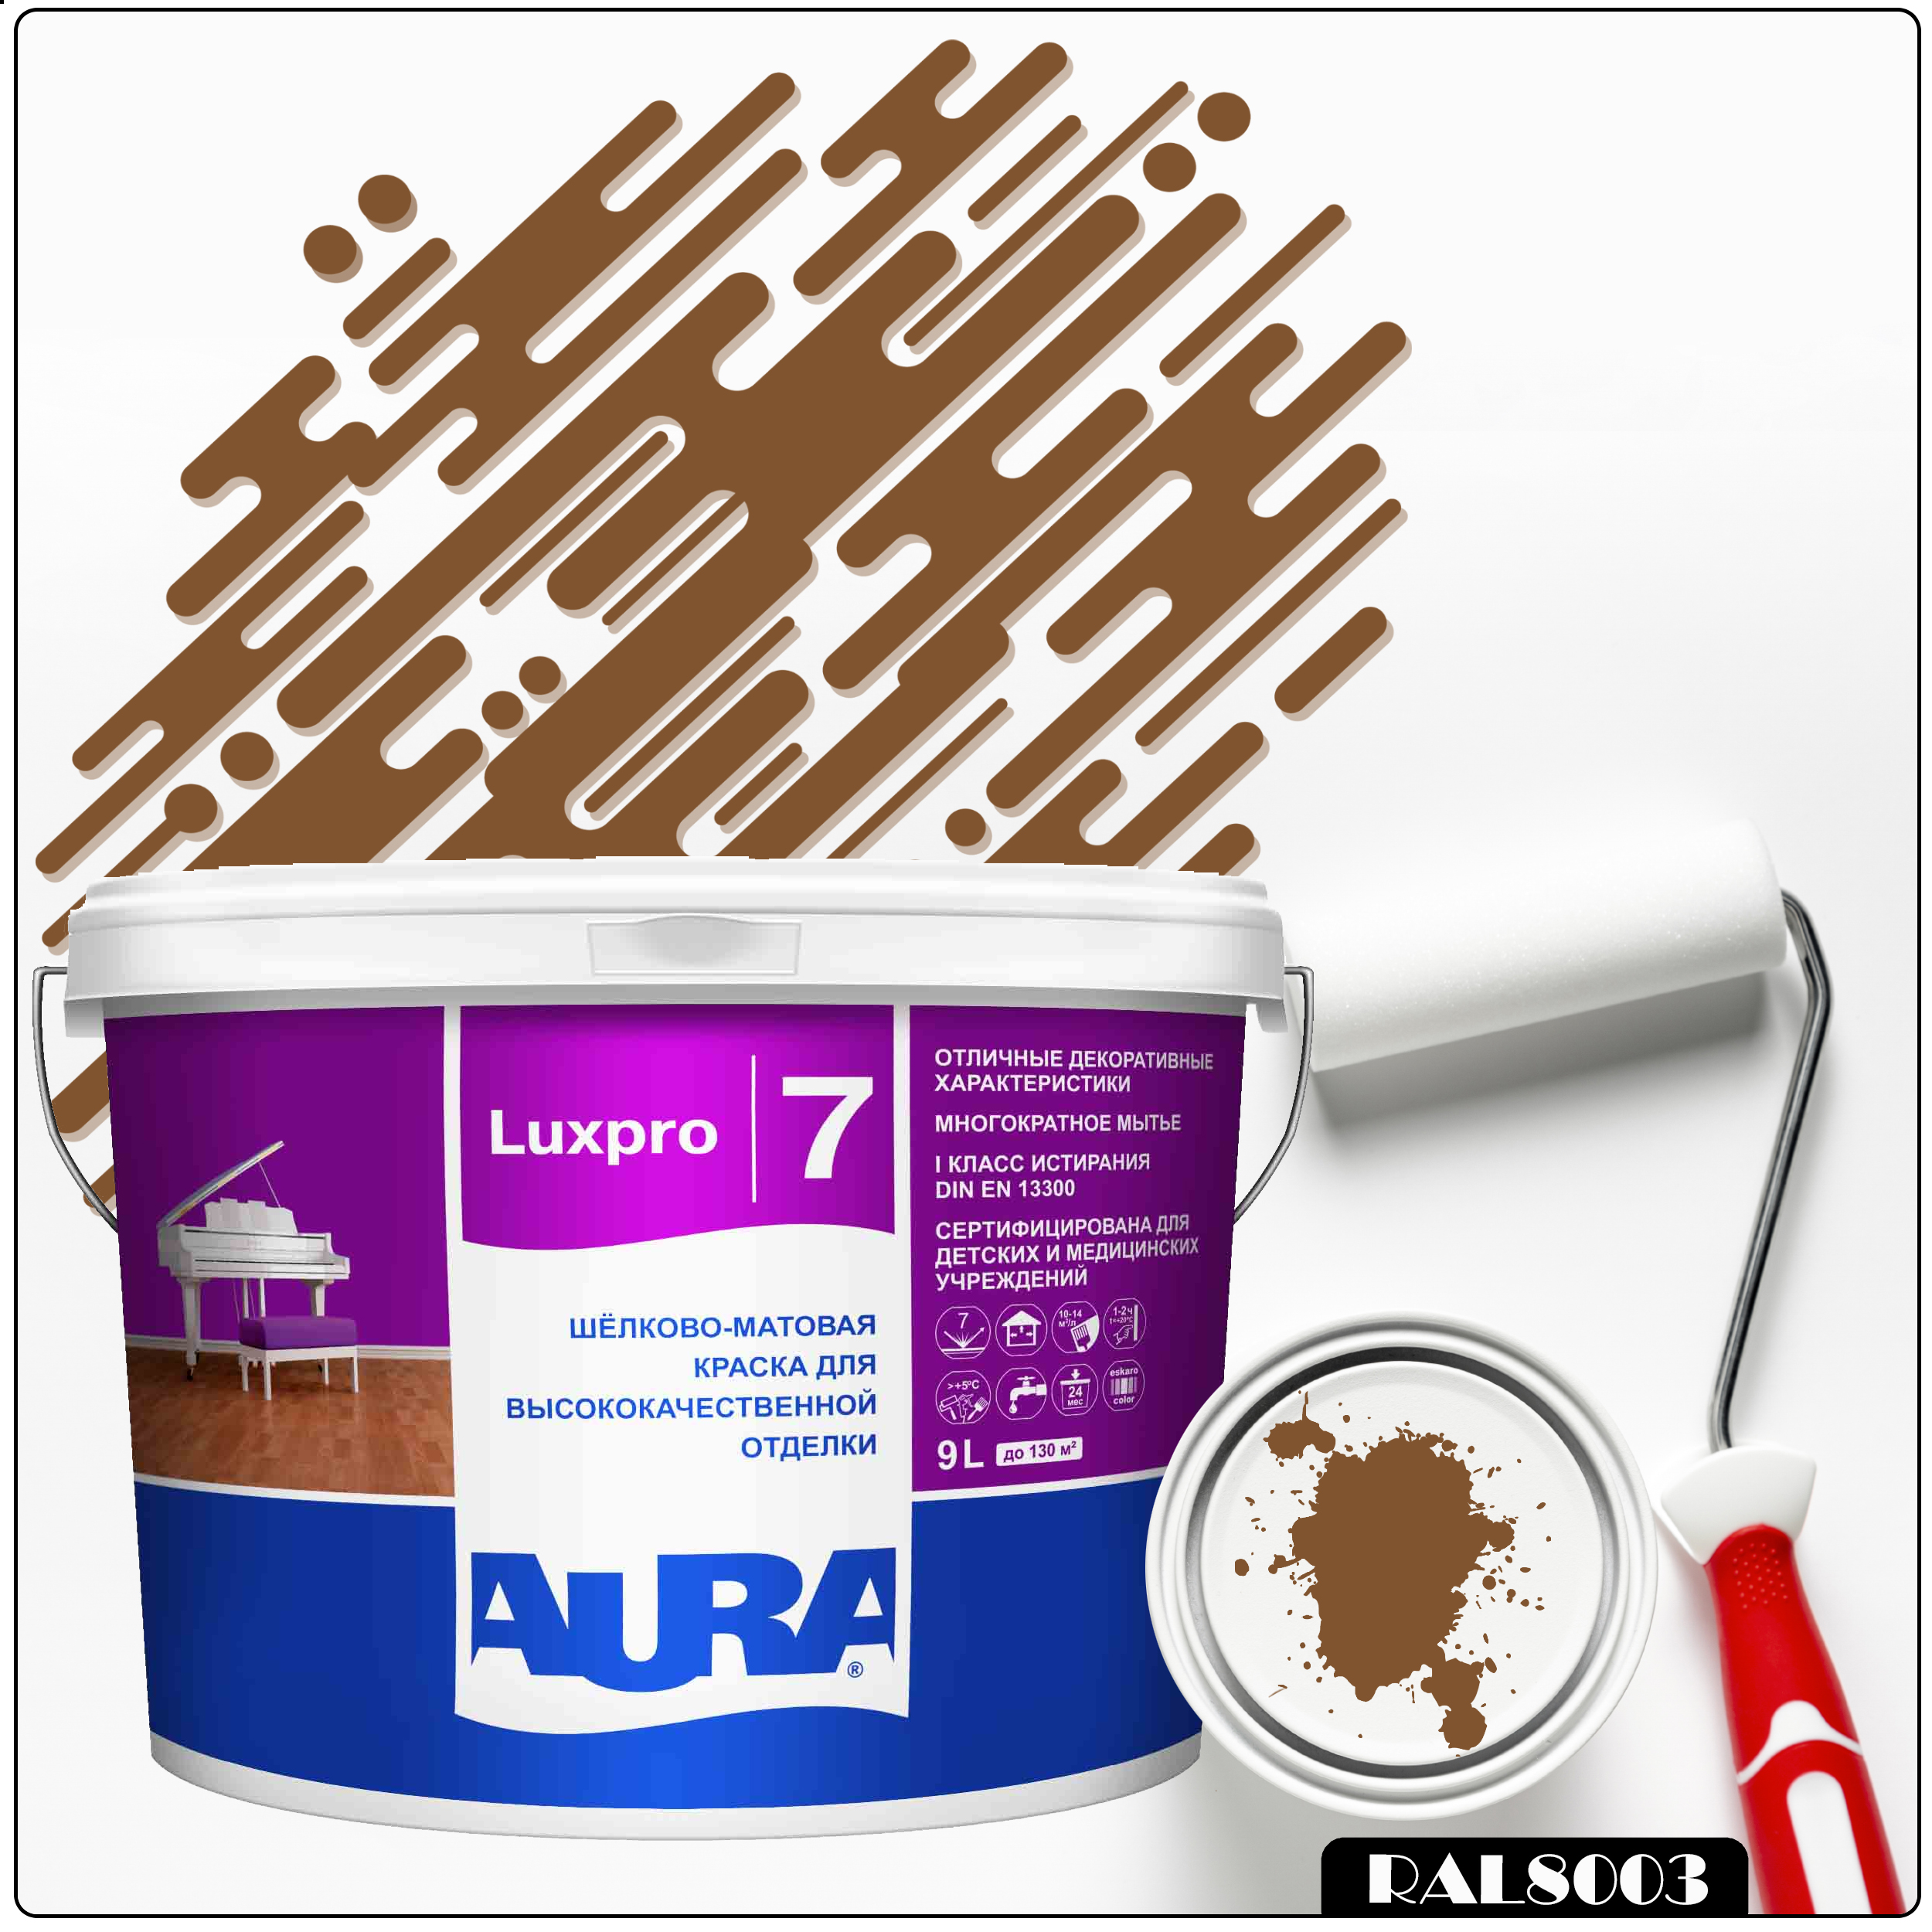 Фото 4 - Краска Aura LuxPRO 7, RAL 8003 Коричневая глина, латексная, шелково-матовая, интерьерная, 9л, Аура.